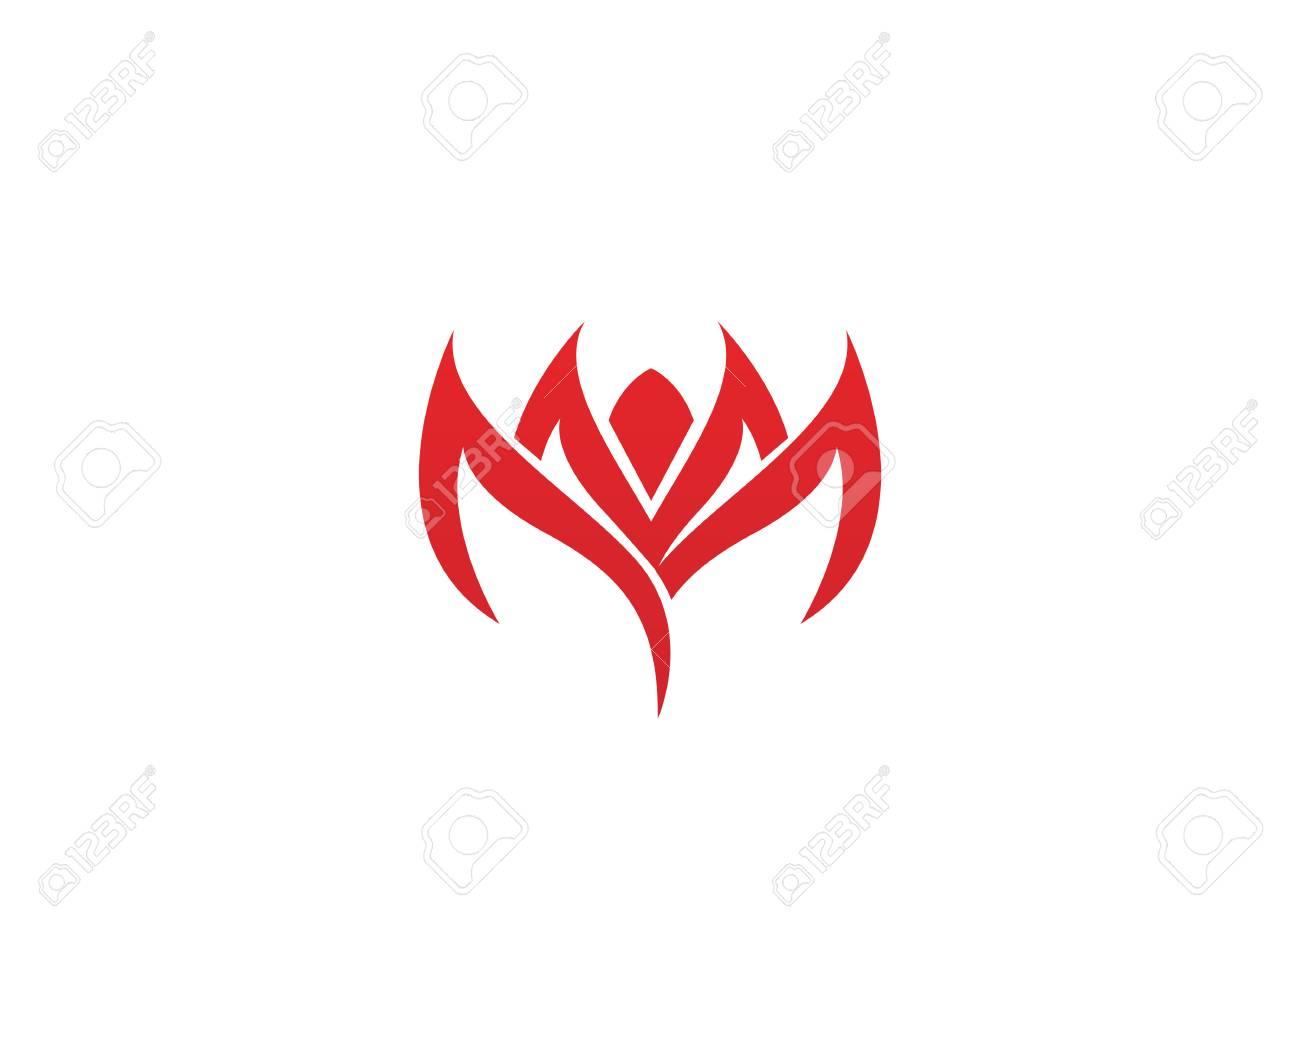 Leaf lotus flower icon and symbols vector royalty free cliparts leaf lotus flower icon and symbols vector stock vector 95411266 mightylinksfo